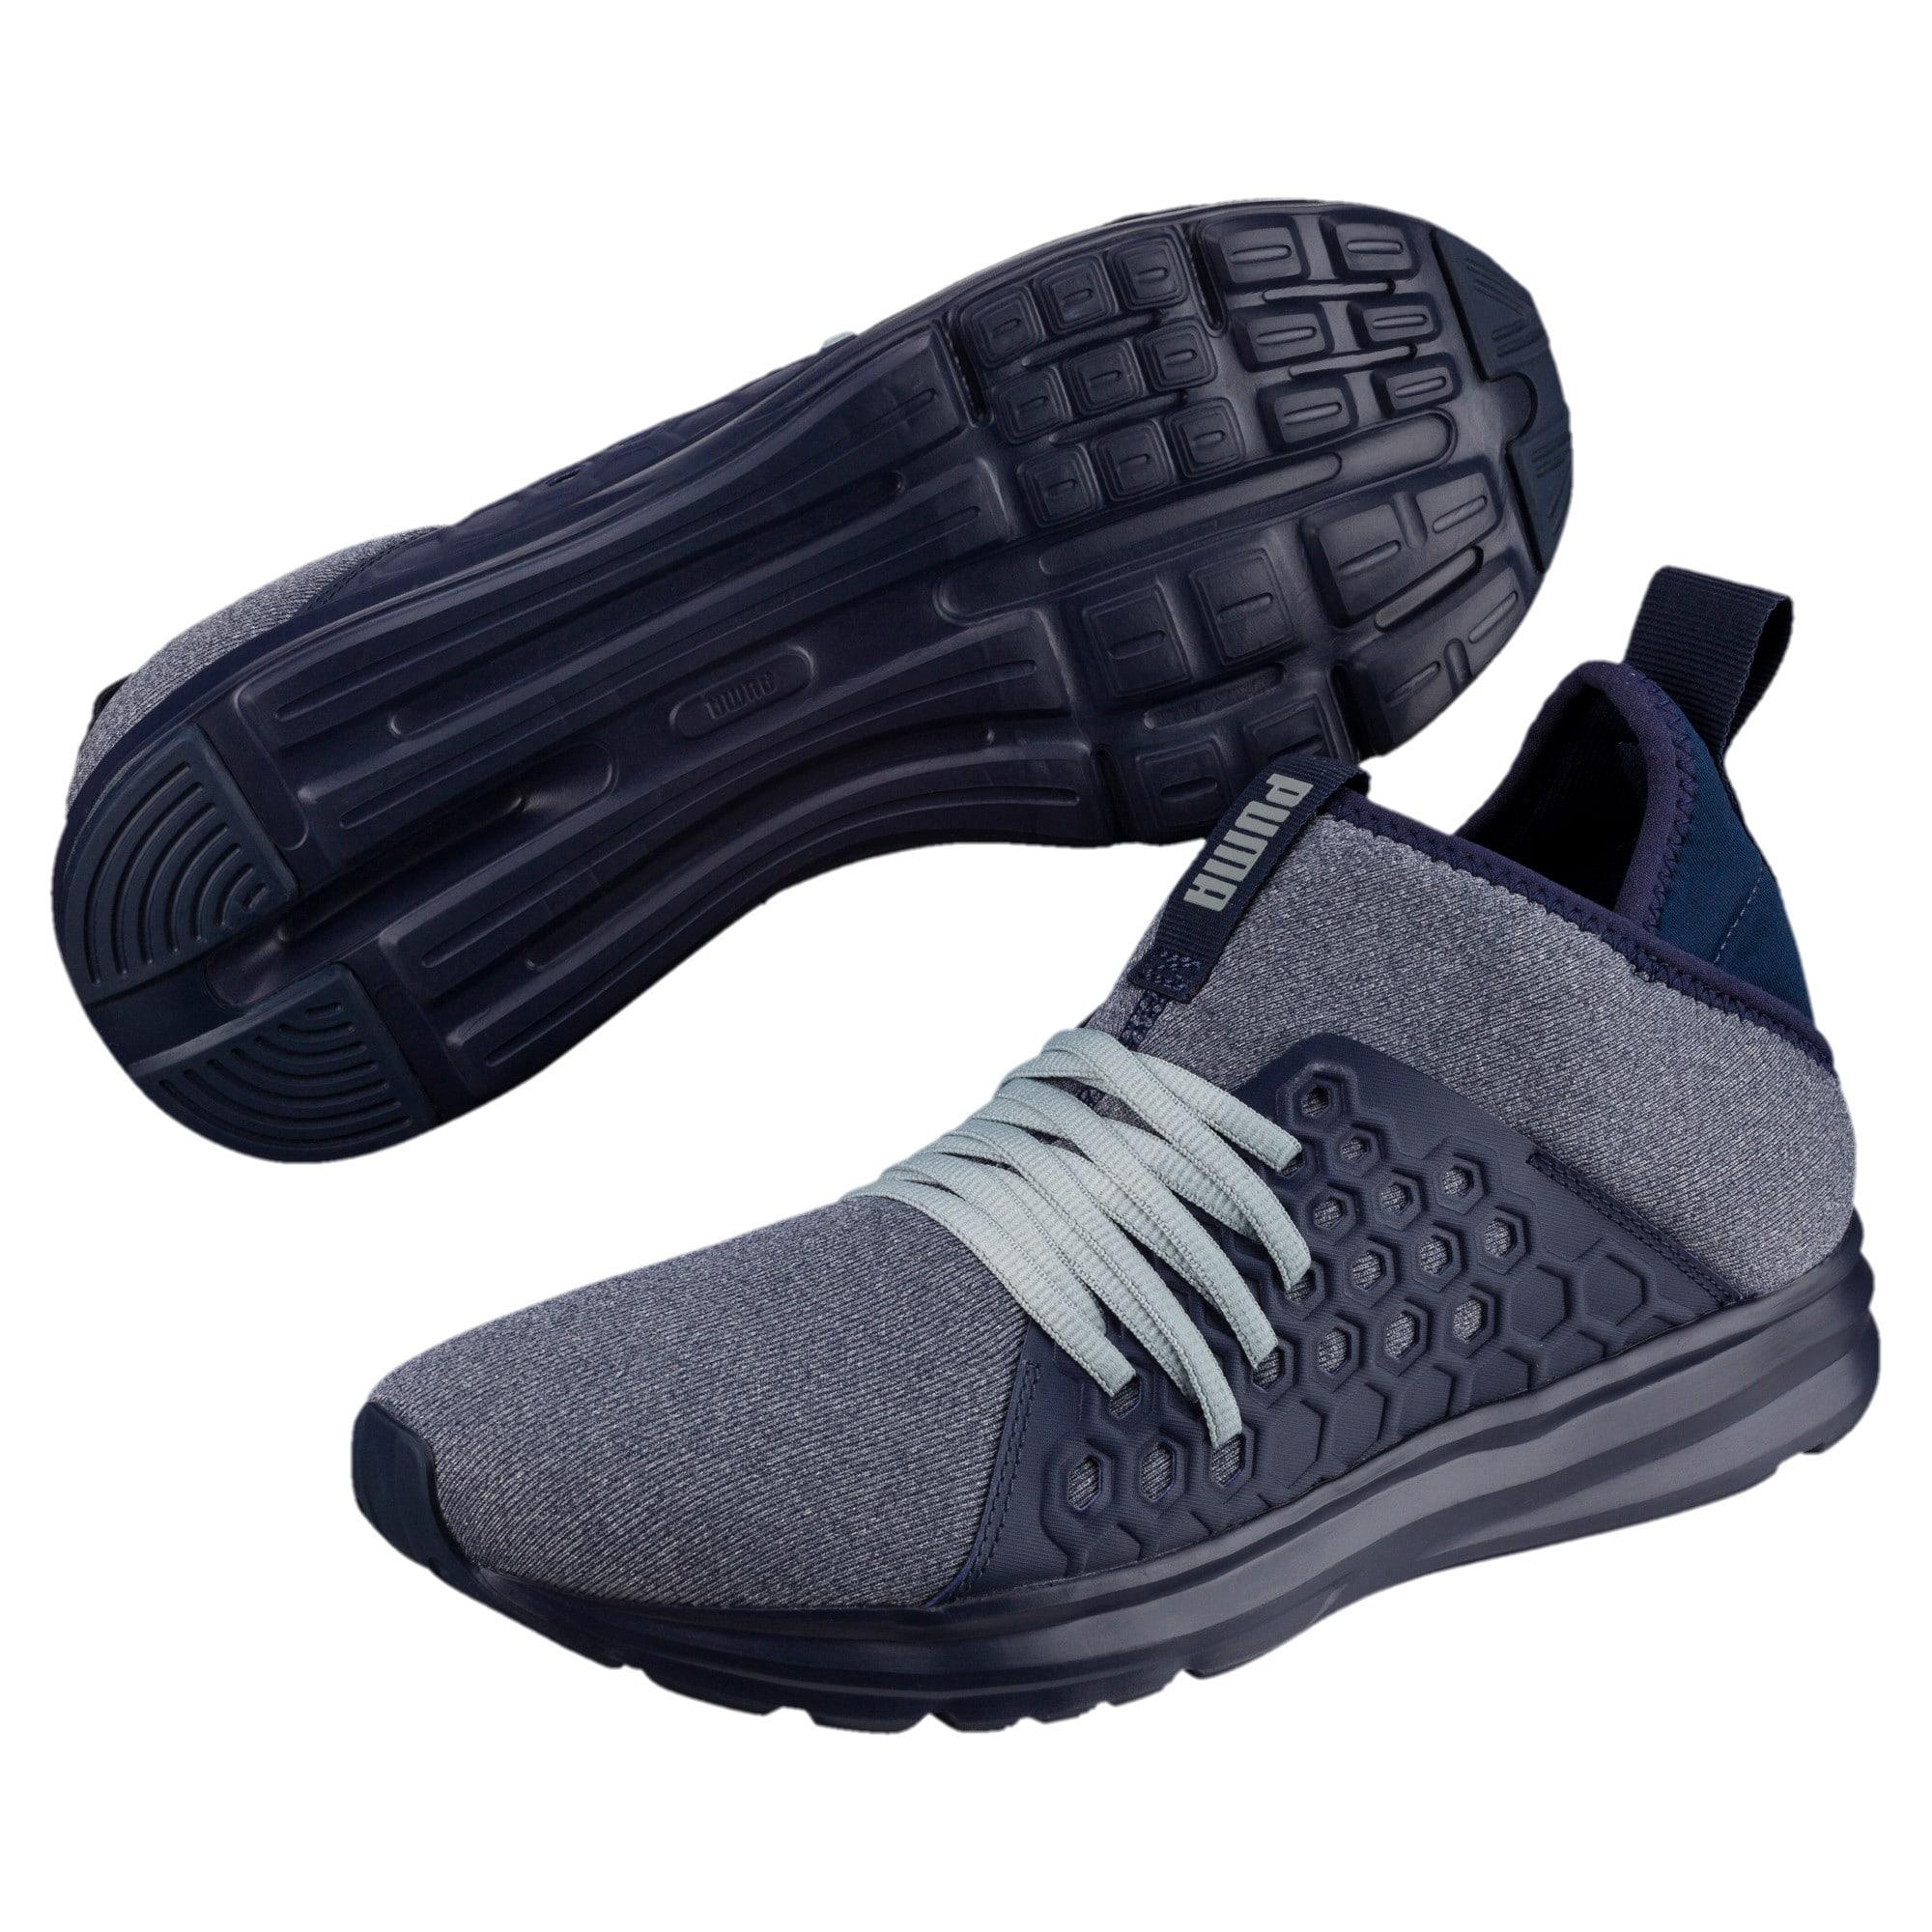 Thumbnail 2 of Enzo NF Mid Men's Training Shoes, Peacoat-Quarry, medium